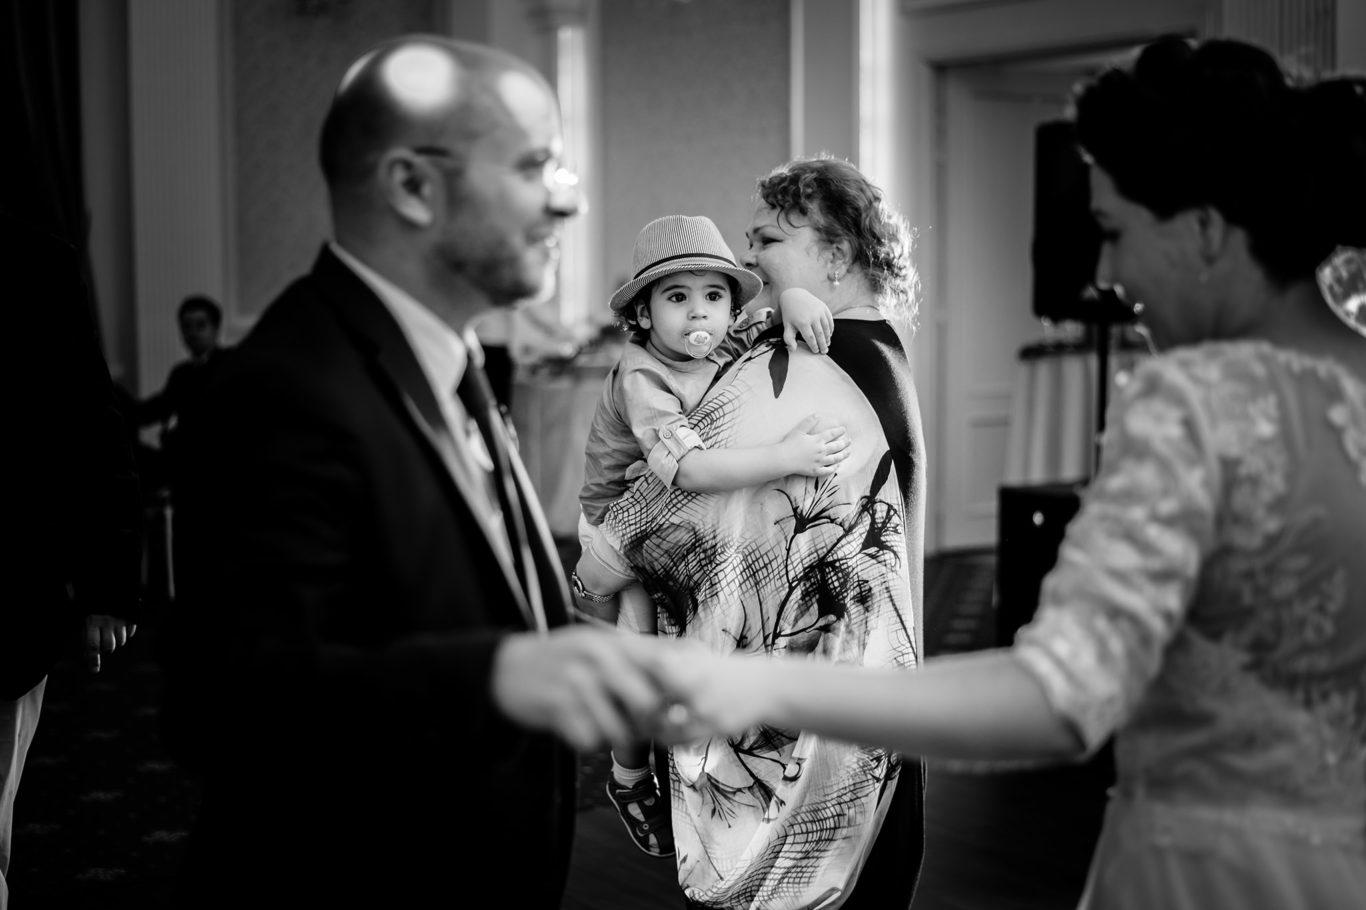 0675-fotografie-nunta-bucuresti-anca-george-fotograf-ciprian-dumitrescu-dsc_9525